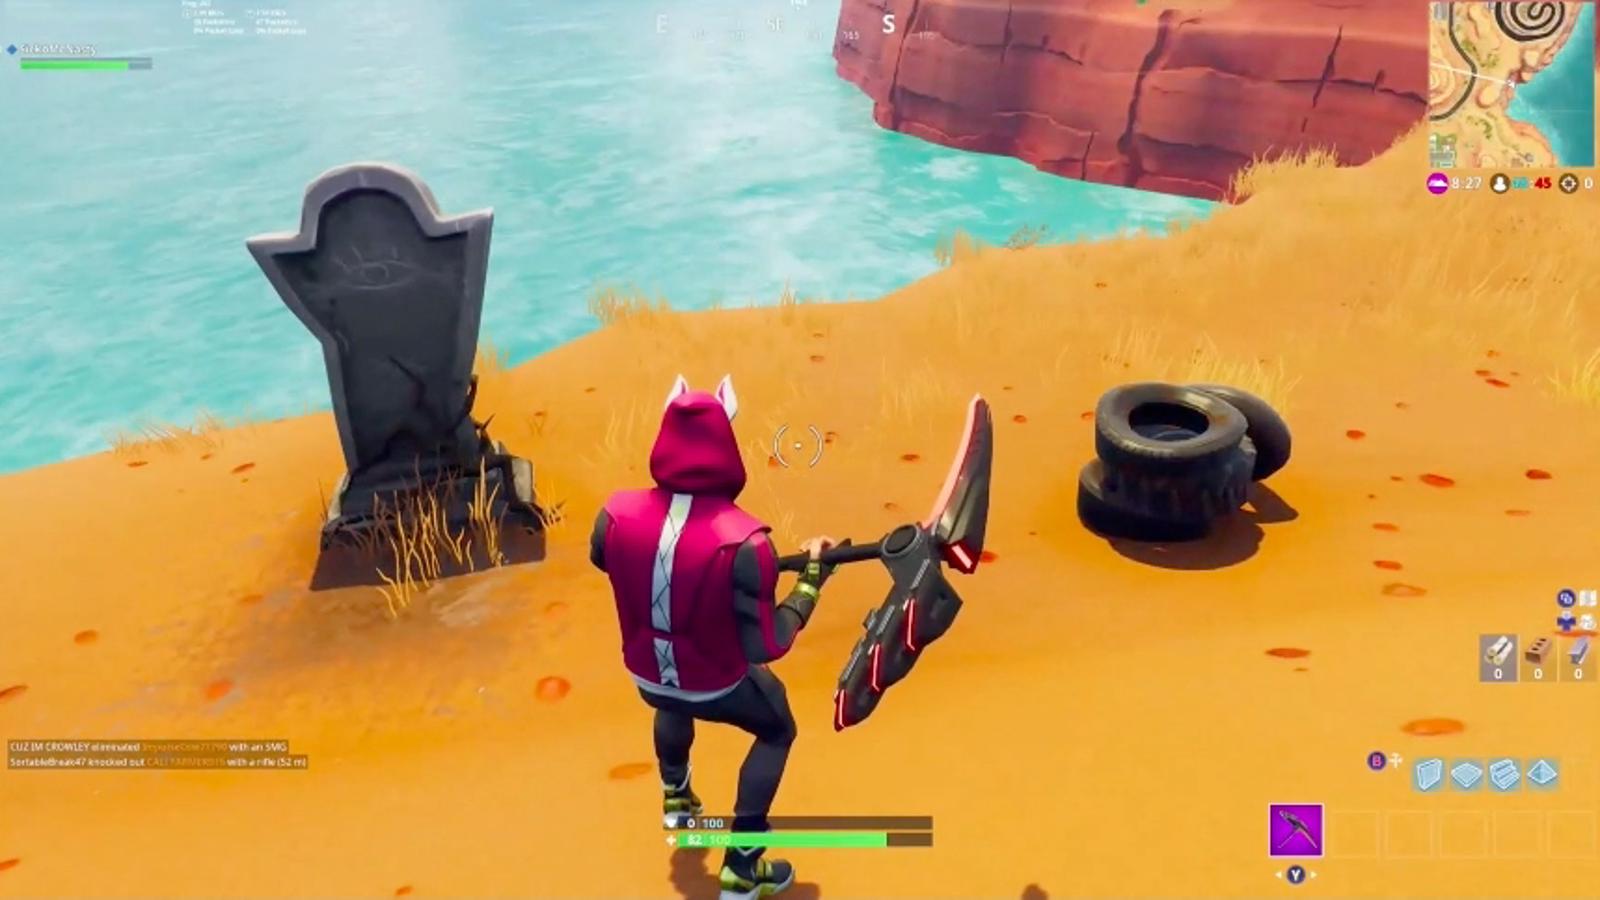 Epic Commemorates Failed Fortnite Rescue Attempt In Game